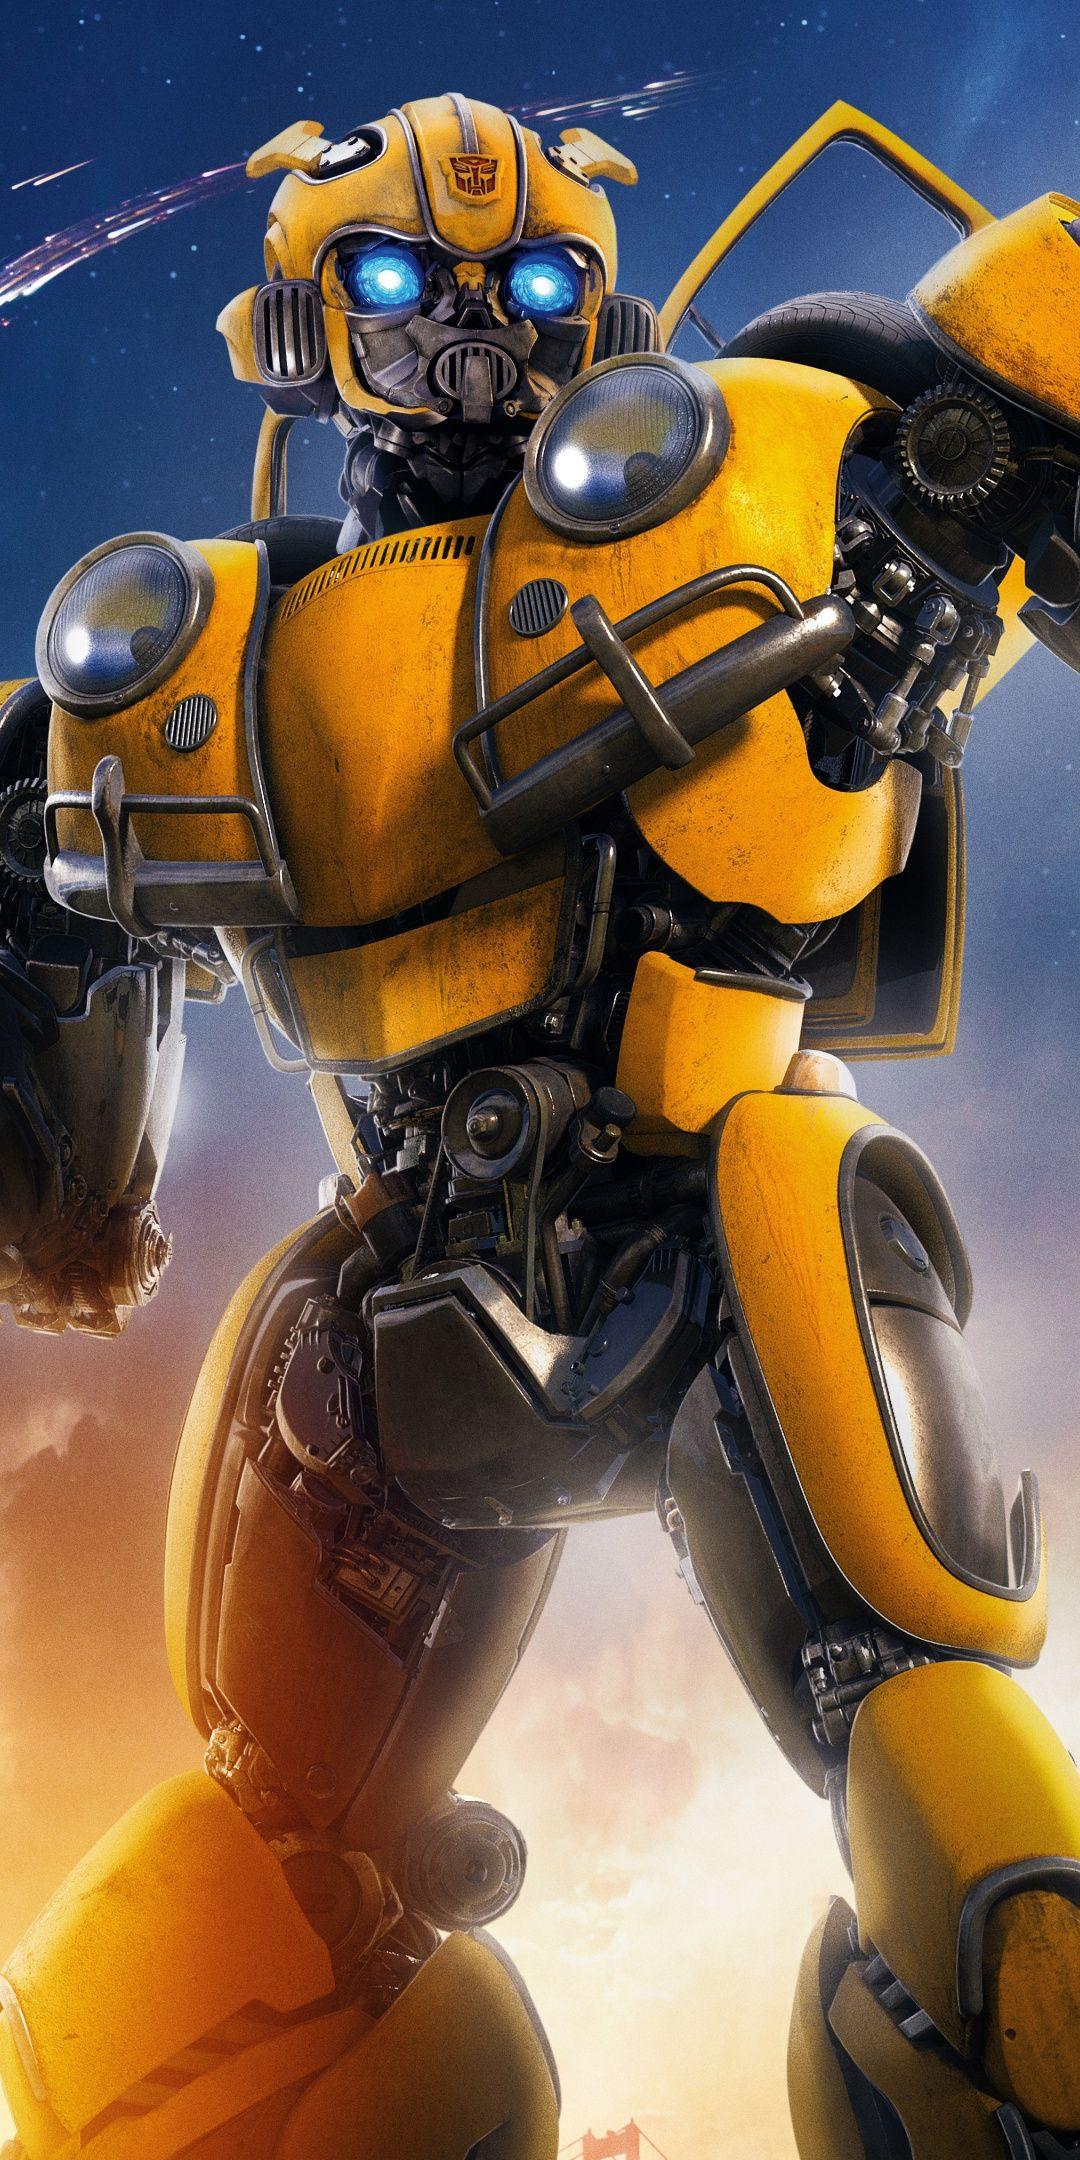 Robot Movie Transformers Bumblebee 1080x2160 Wallpaper Transformers Bumblebee Transformers Artwork Transformers Movie